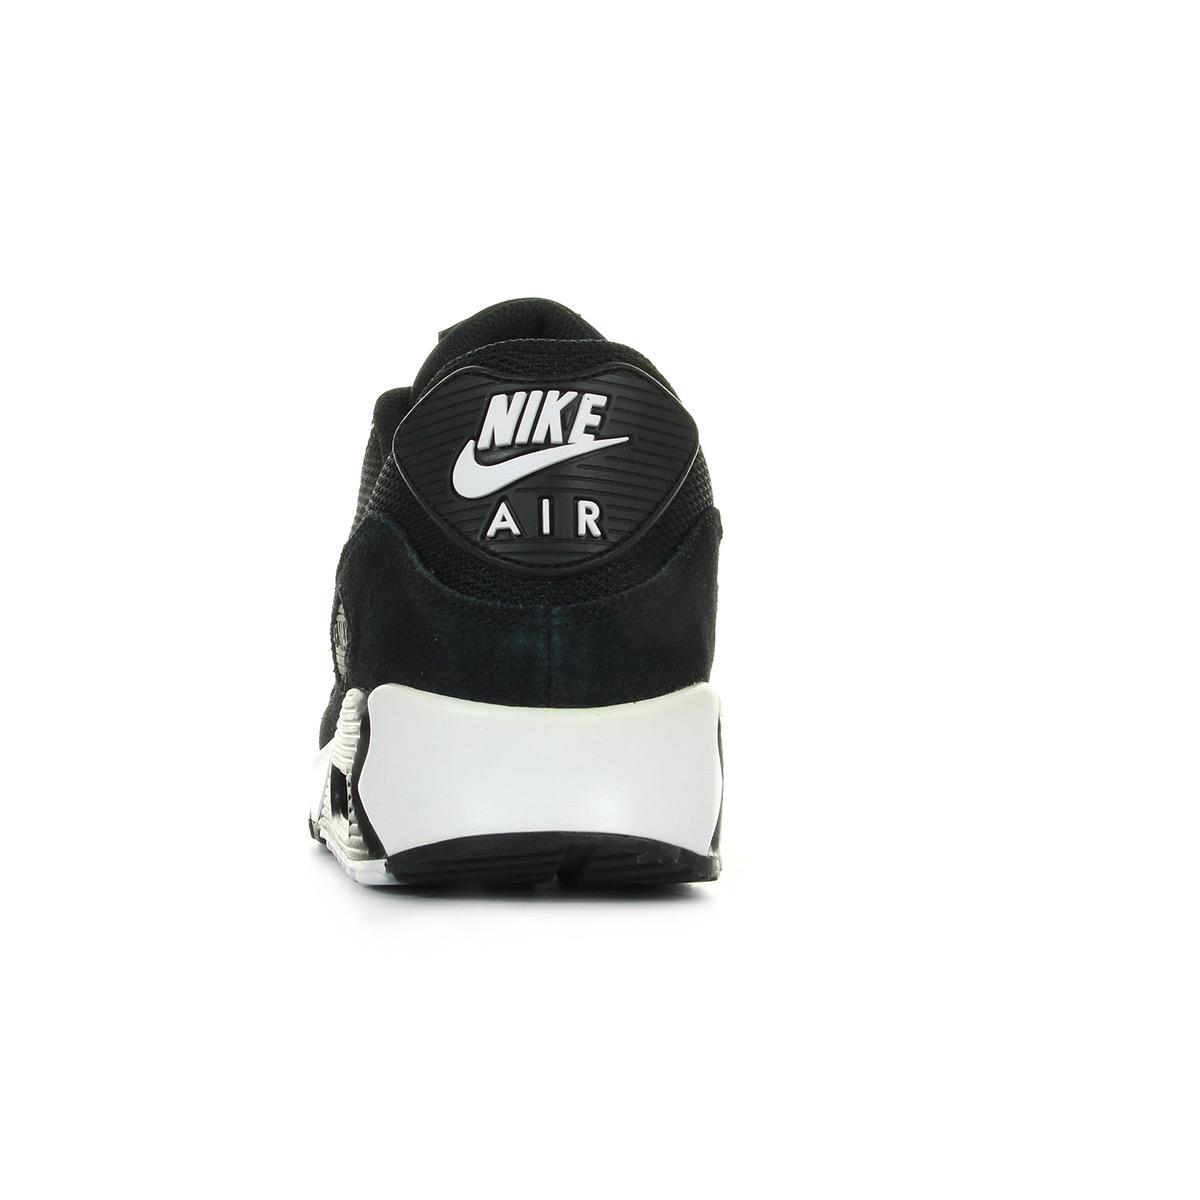 Nike Air max 90 Essential 537384077, Baskets mode homme